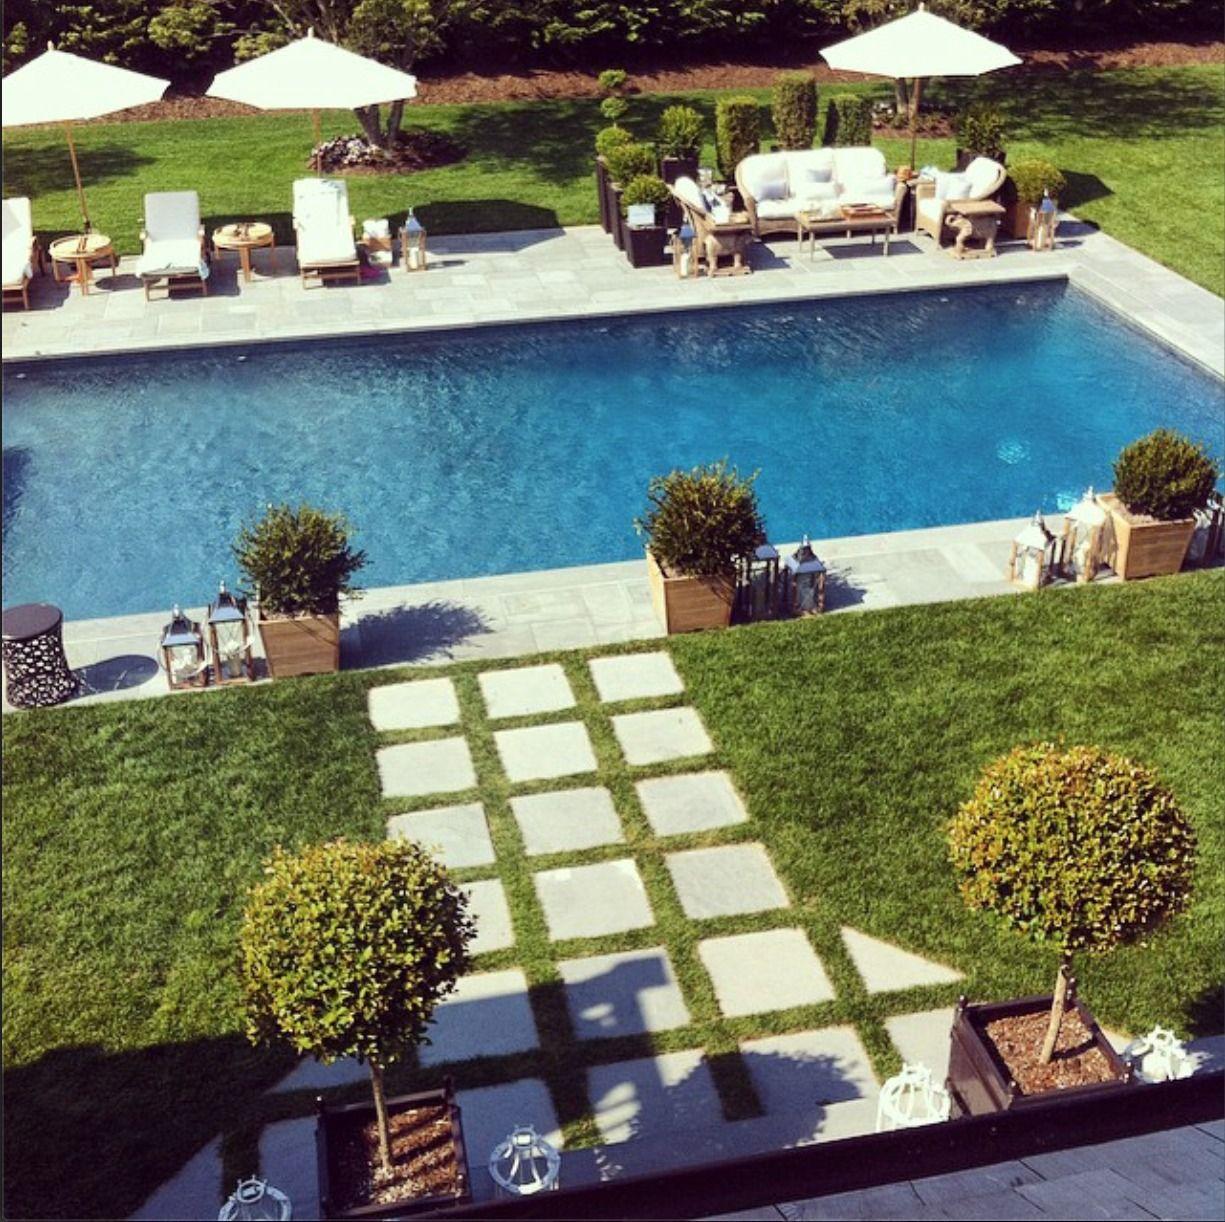 Hampton designer showhouse 2014 designers backyard and for Pool design hamptons